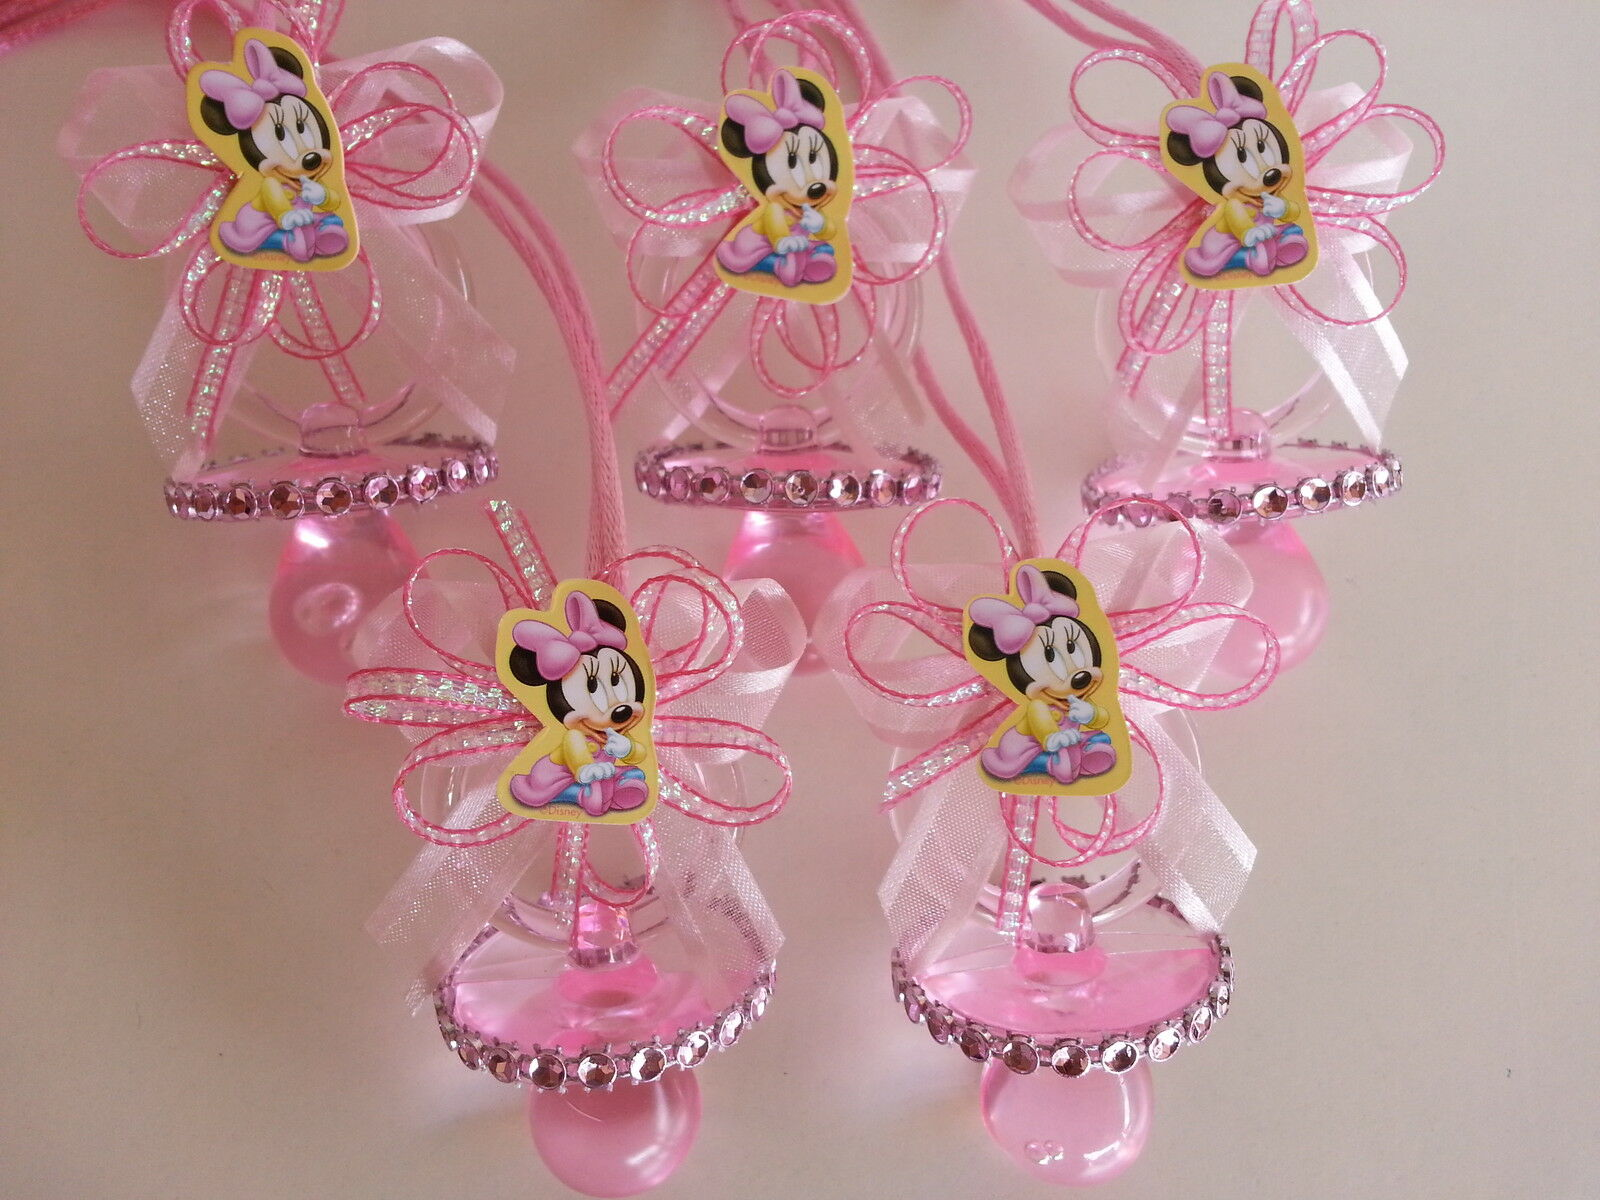 Minnie mouse centerpiece bottle large 14 baby shower - Minnie mouse baby shower decorations ...